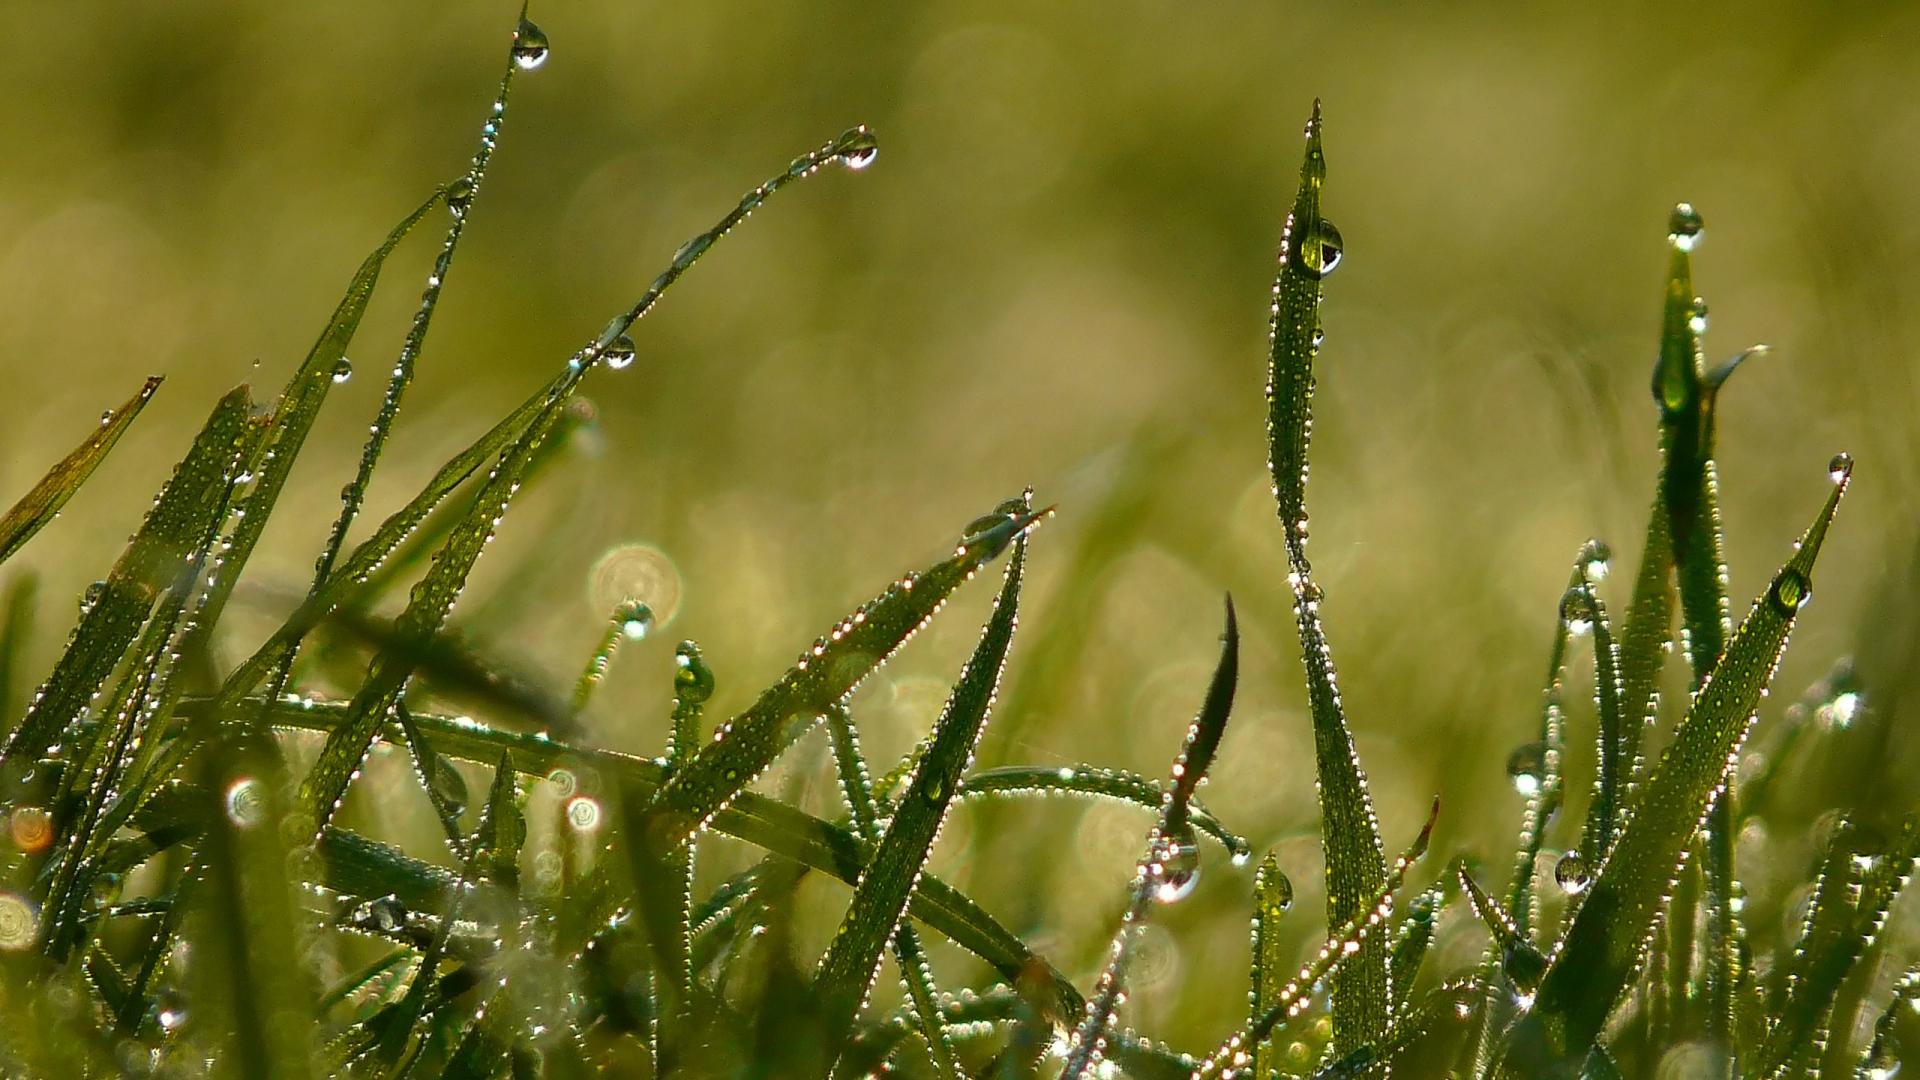 download wallpaper 1920x1080 drops, morning, dew, summer, grass